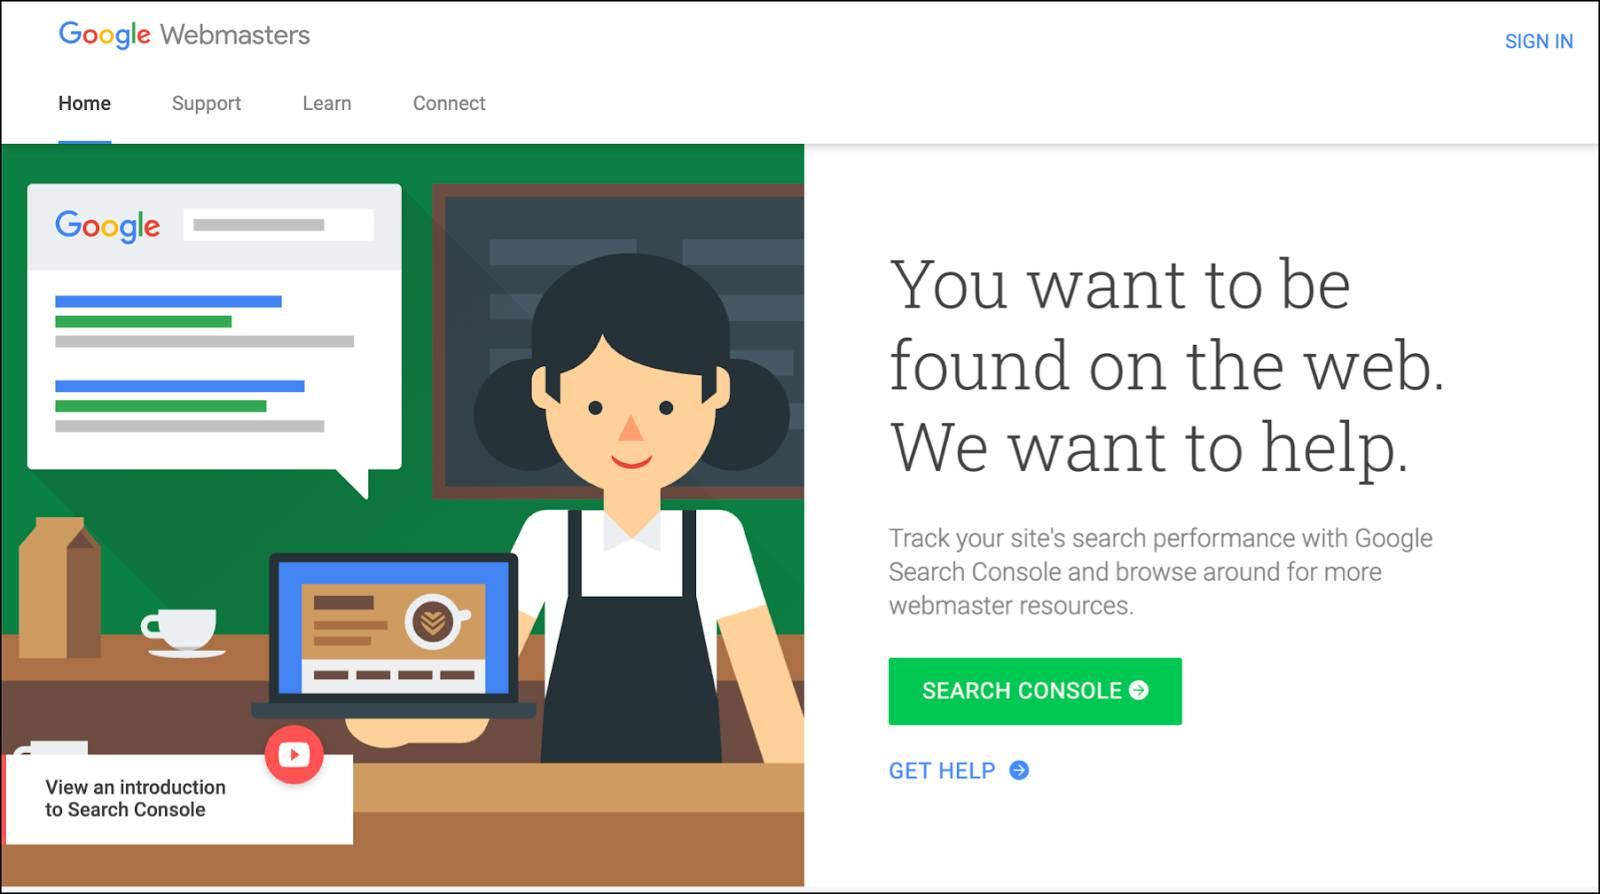 Google Webmaster Tools page